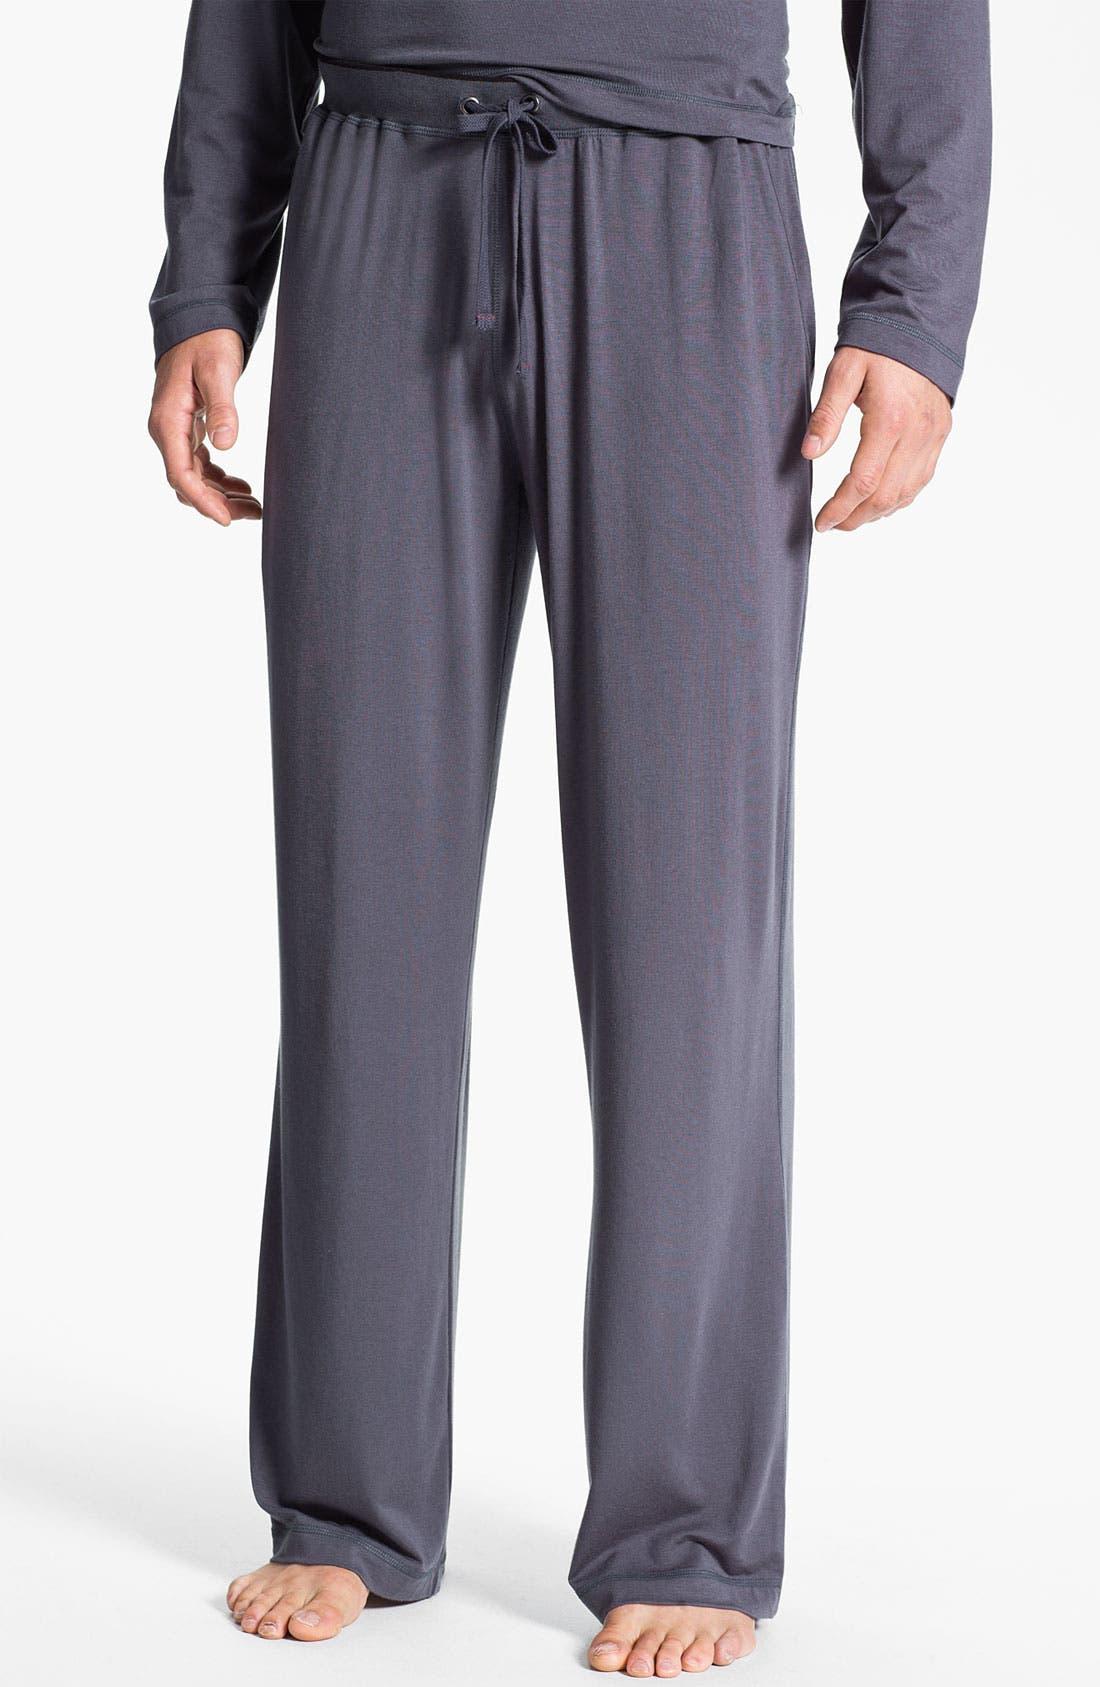 Alternate Image 1 Selected - Daniel Buchler Silk & Modal Lounge Pants